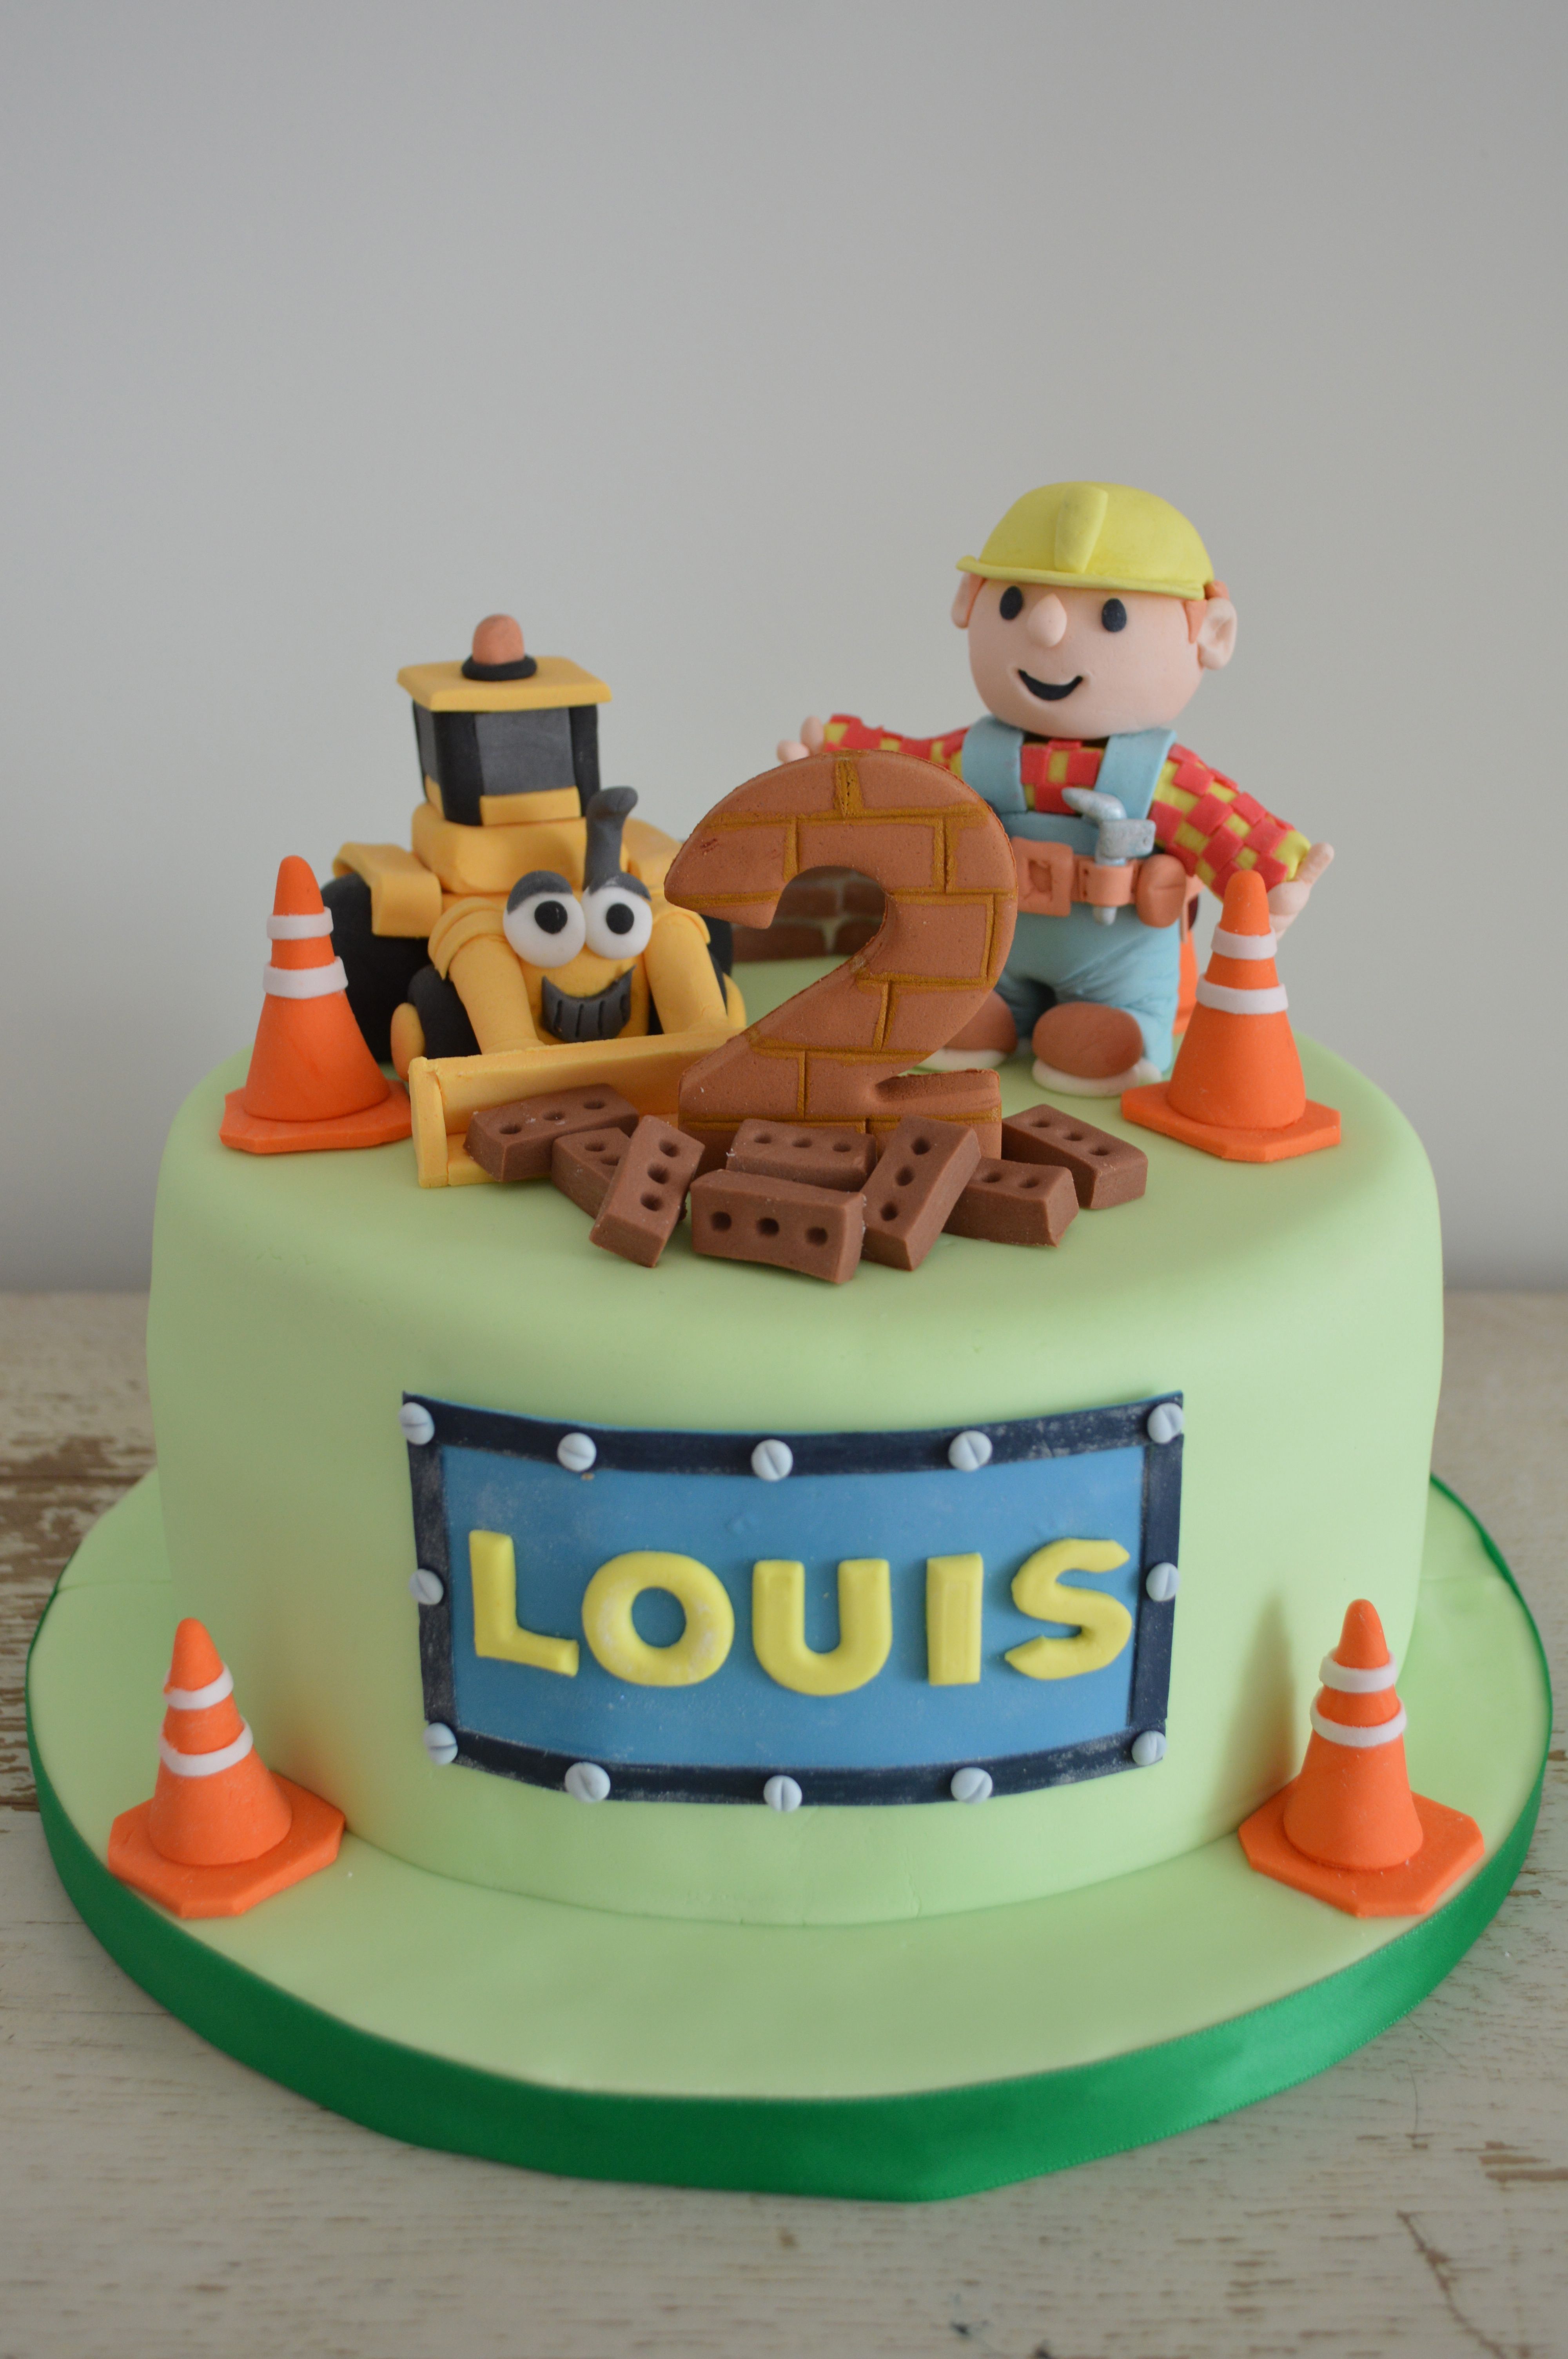 Bob the Builder Cake torte Pinterest Bobs Cake and Birthdays